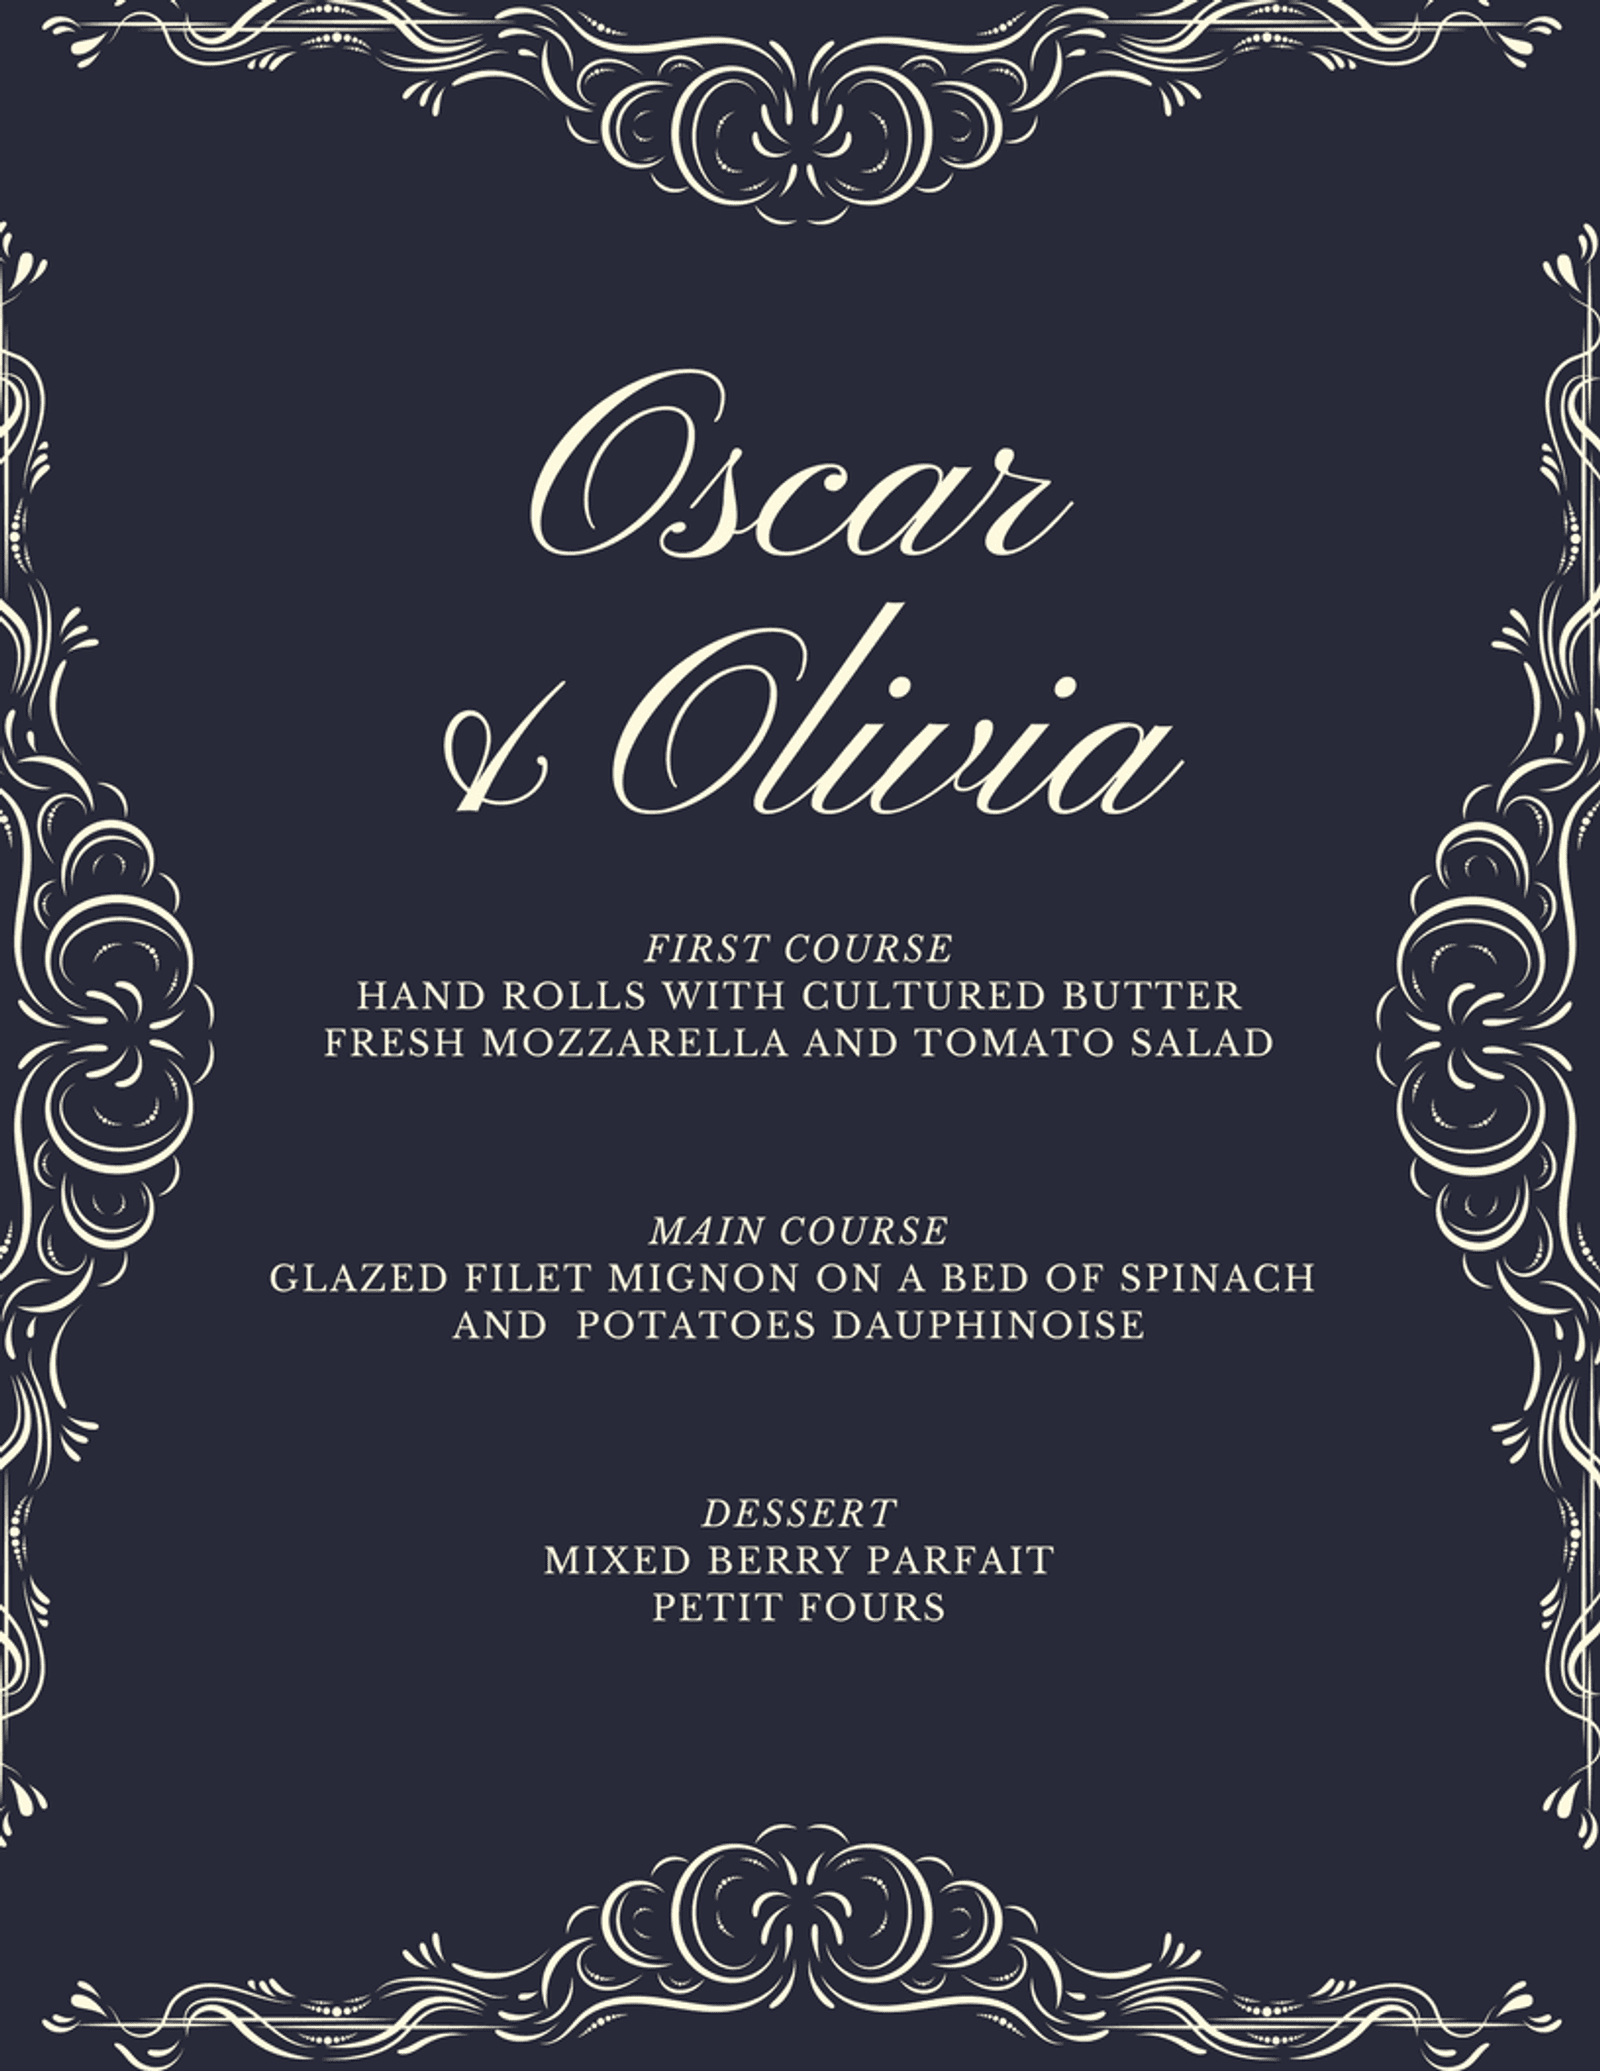 Get The Look Royal Wedding Invitation Templates